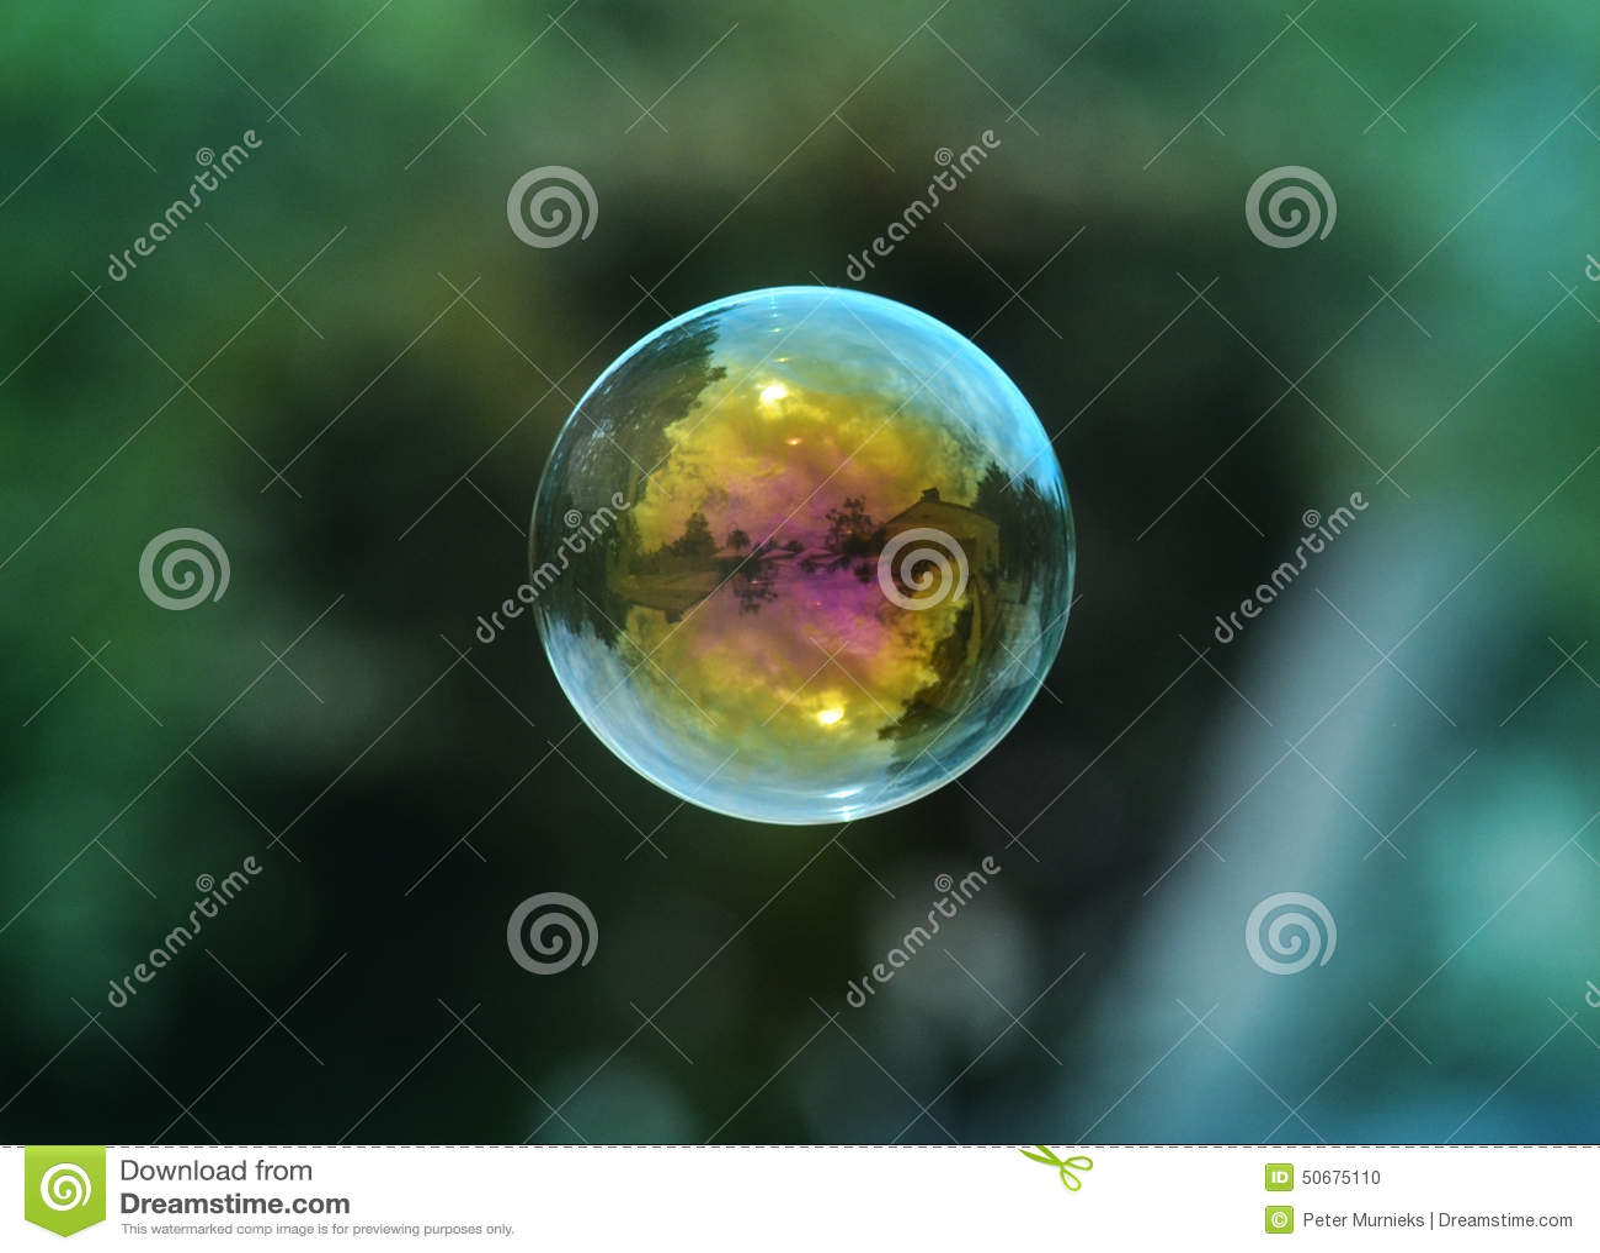 Download 漂浮在天空的泡影 库存照片. 图片 包括有 的treadled, 庭院, bubblegum, 王子, 符号 - 50675110